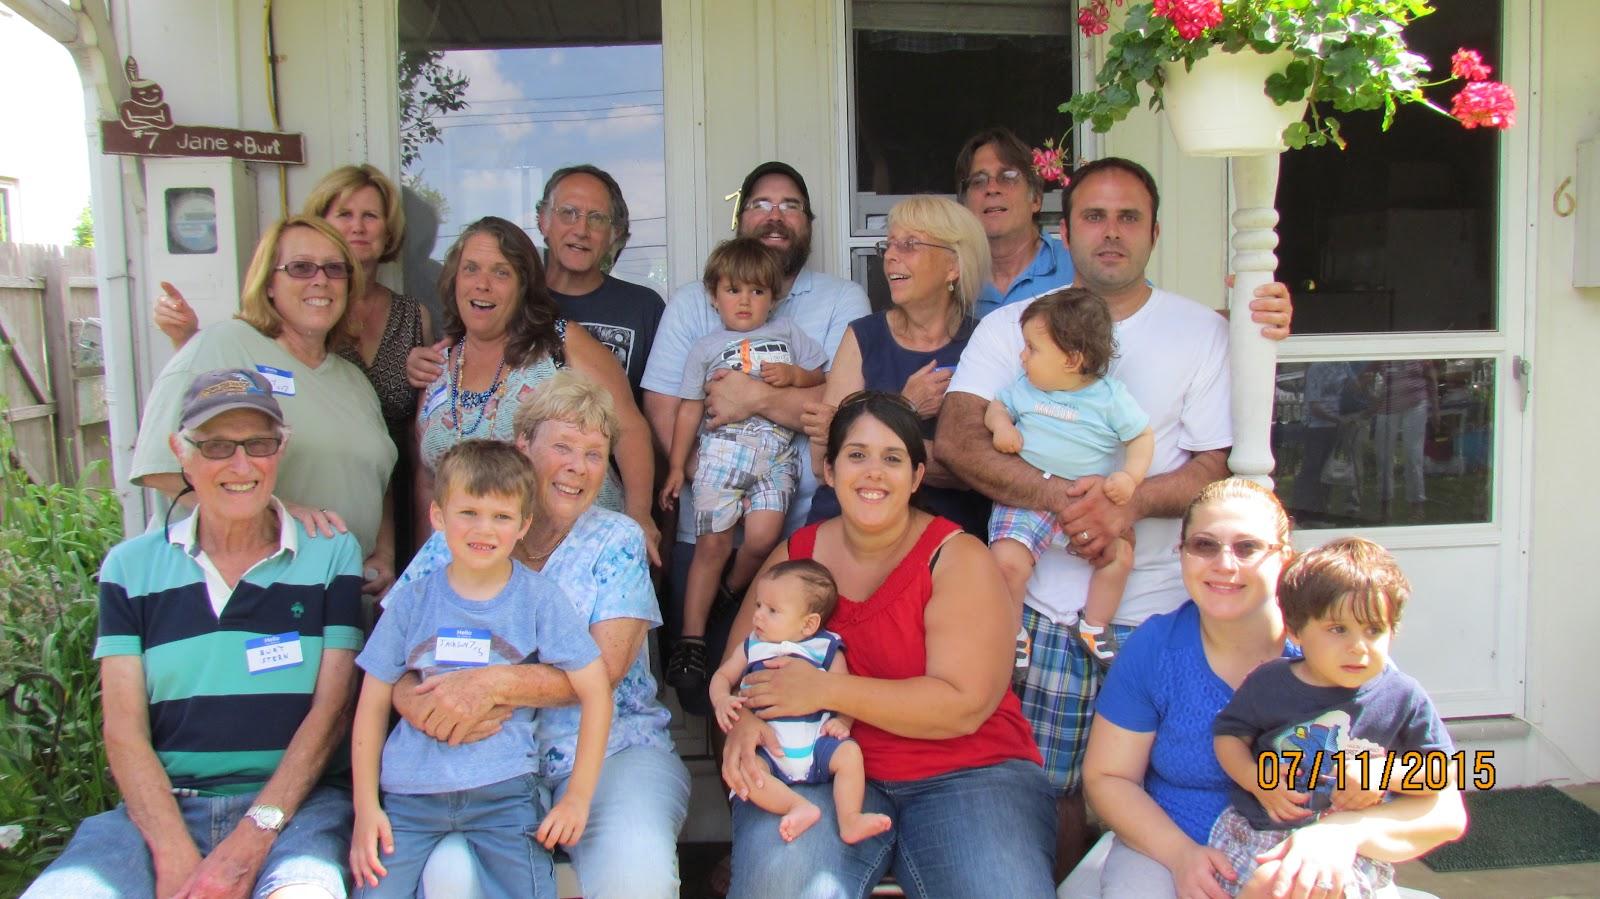 Community Event 2015: Oak Hill Beach Club 100 Anniversary Picnic